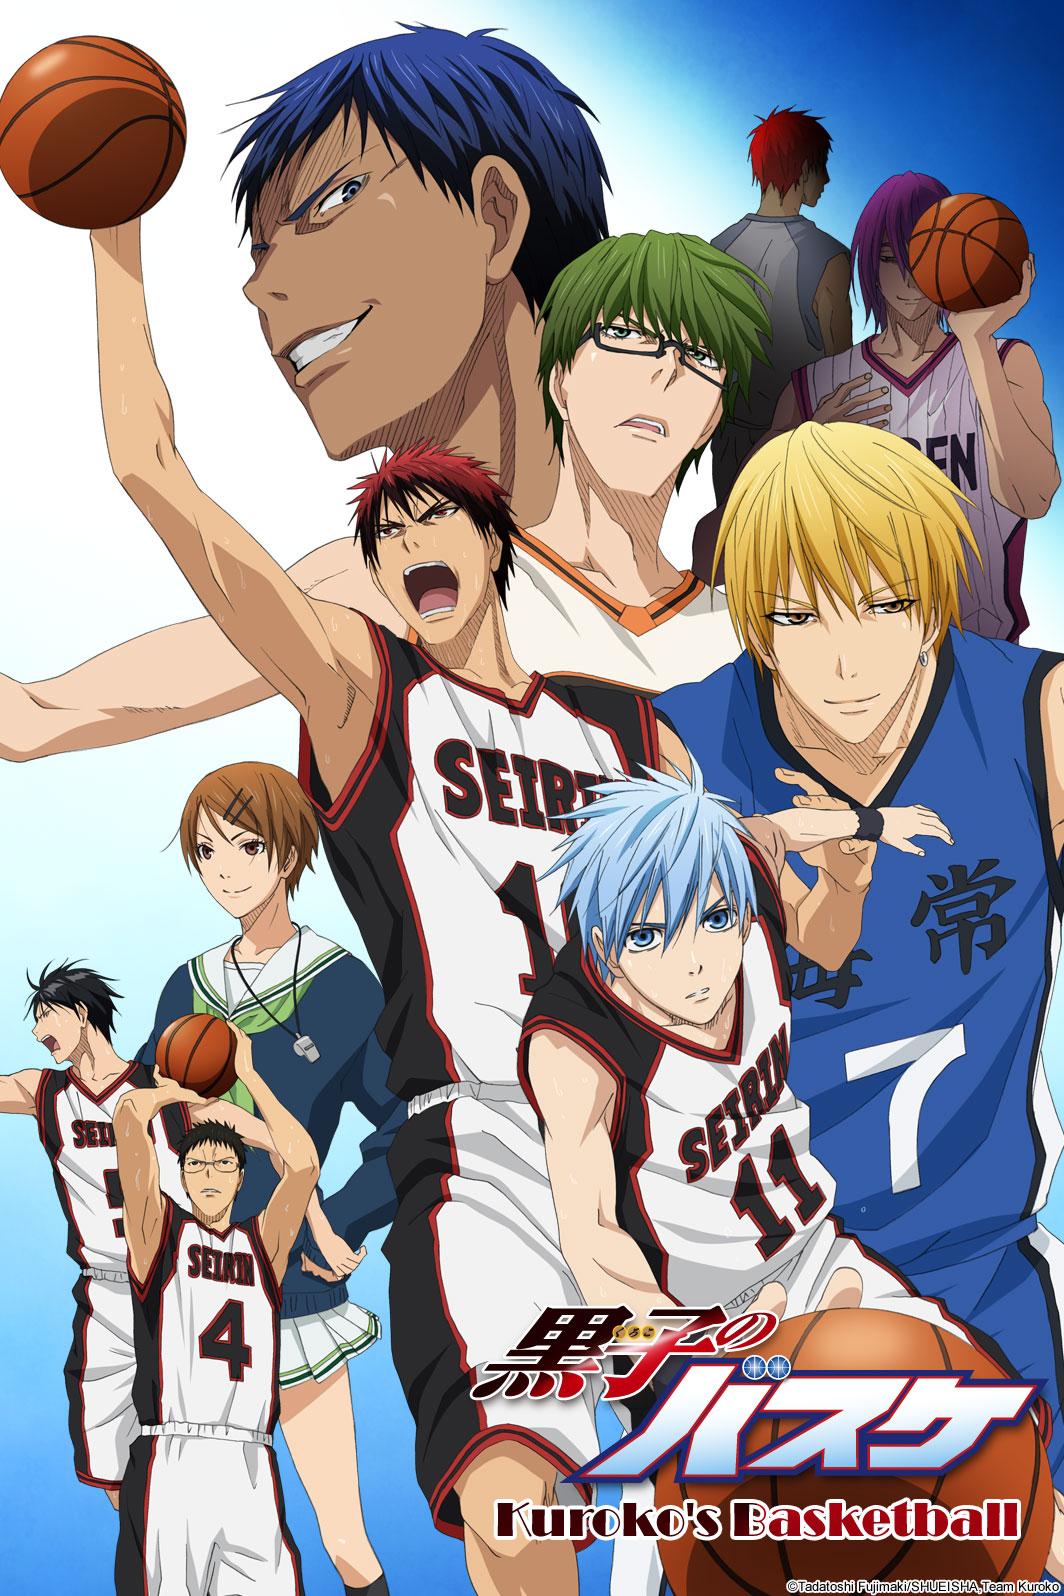 Kuroko's Basketball - Watch on Crunchyroll